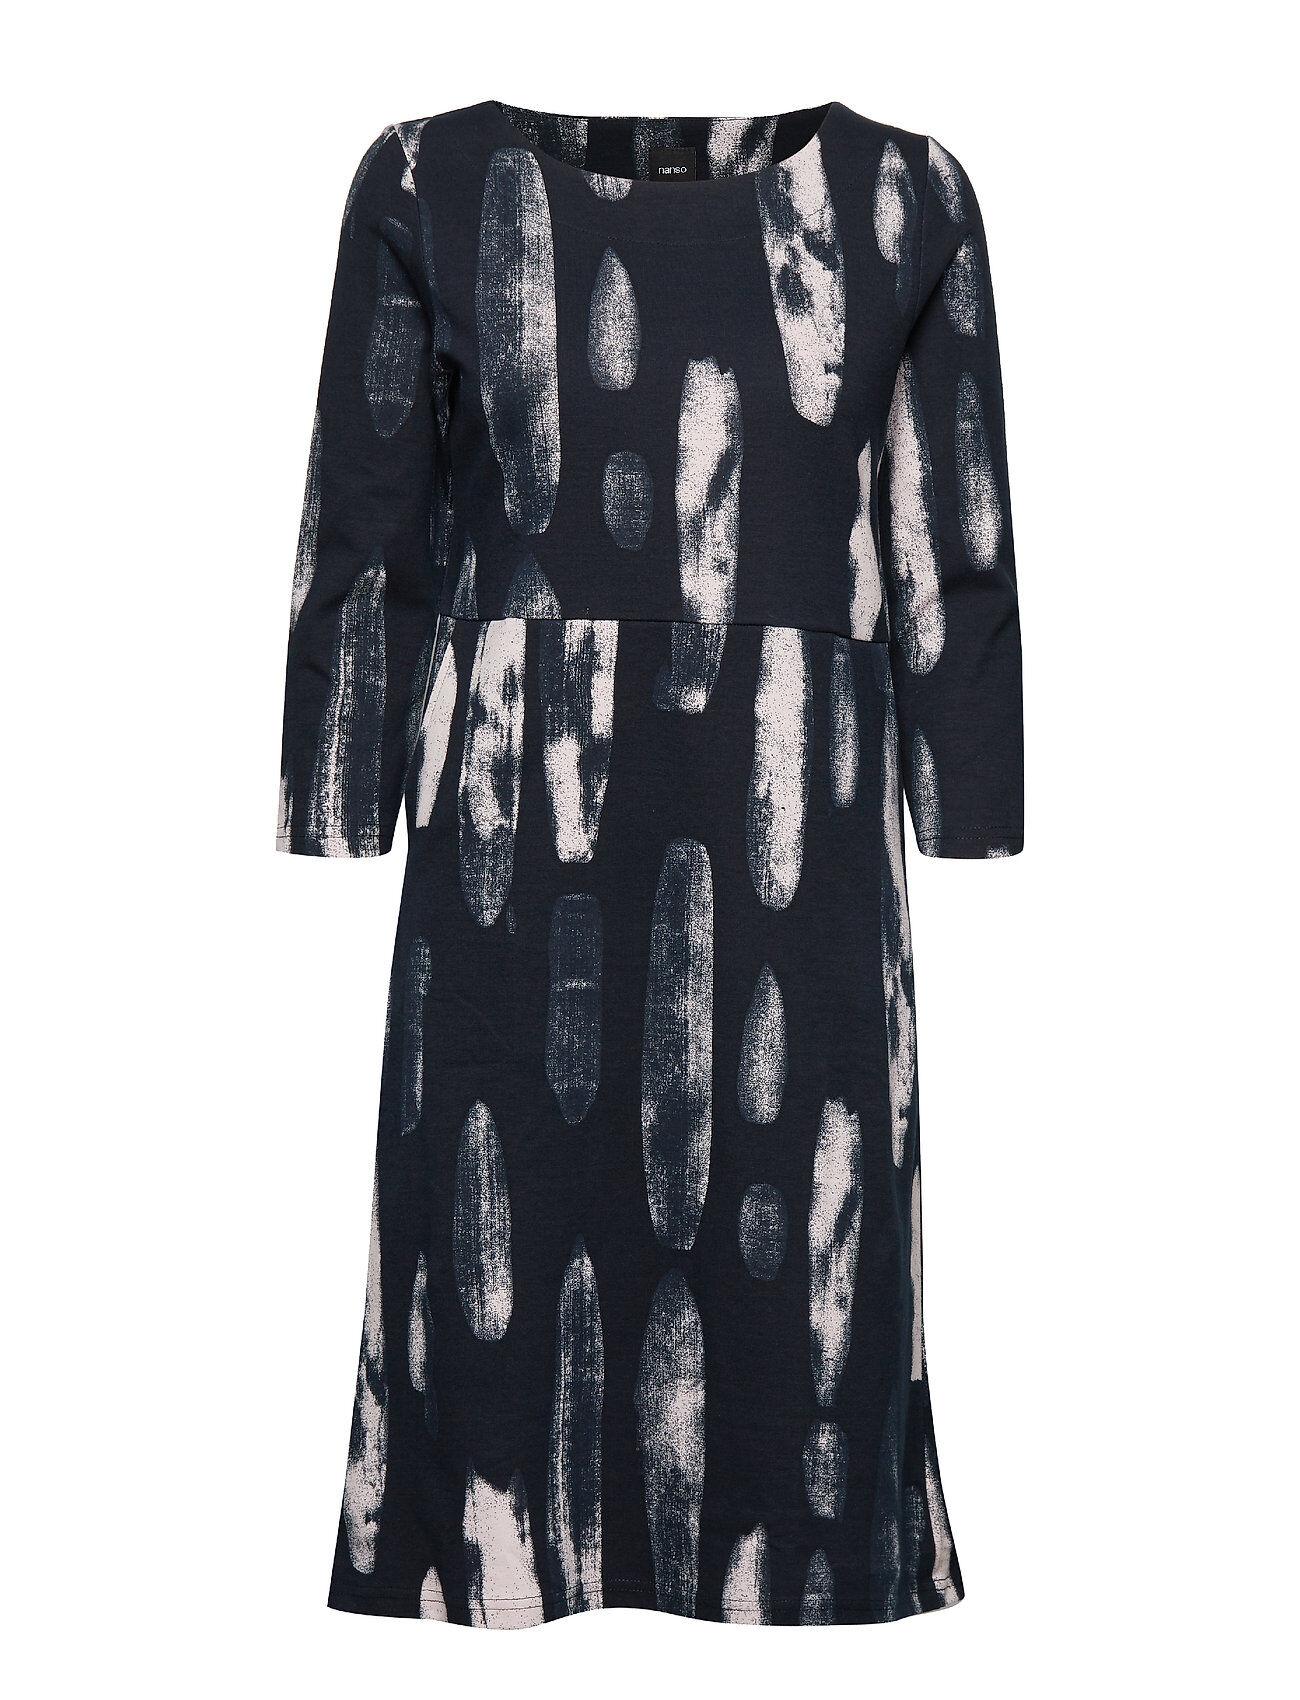 Nanso Ladies Dress, Maali